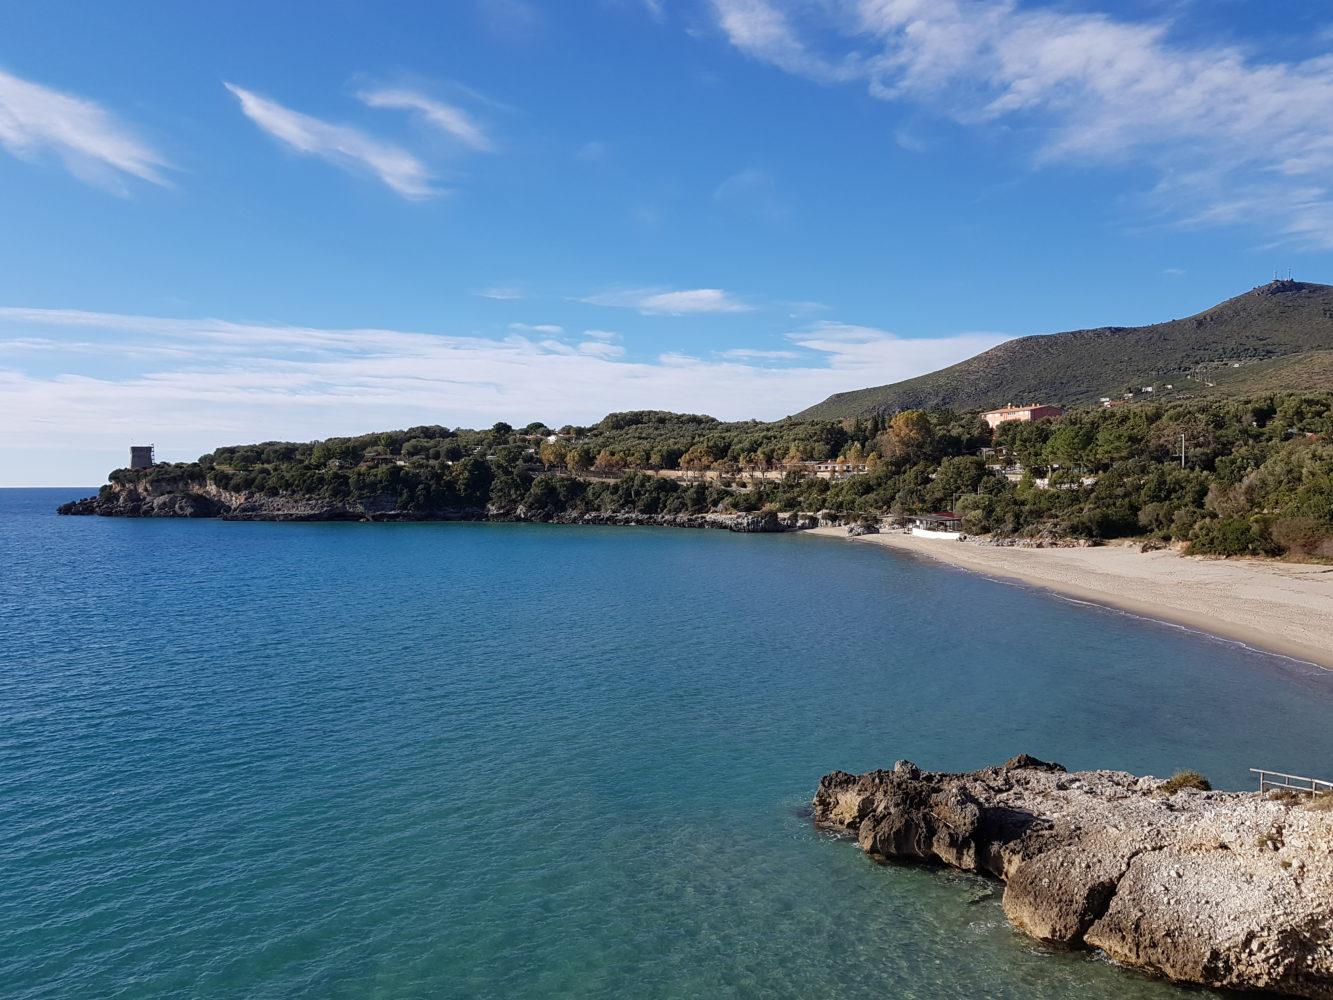 Spiaggia la calanca Marina di Camerota